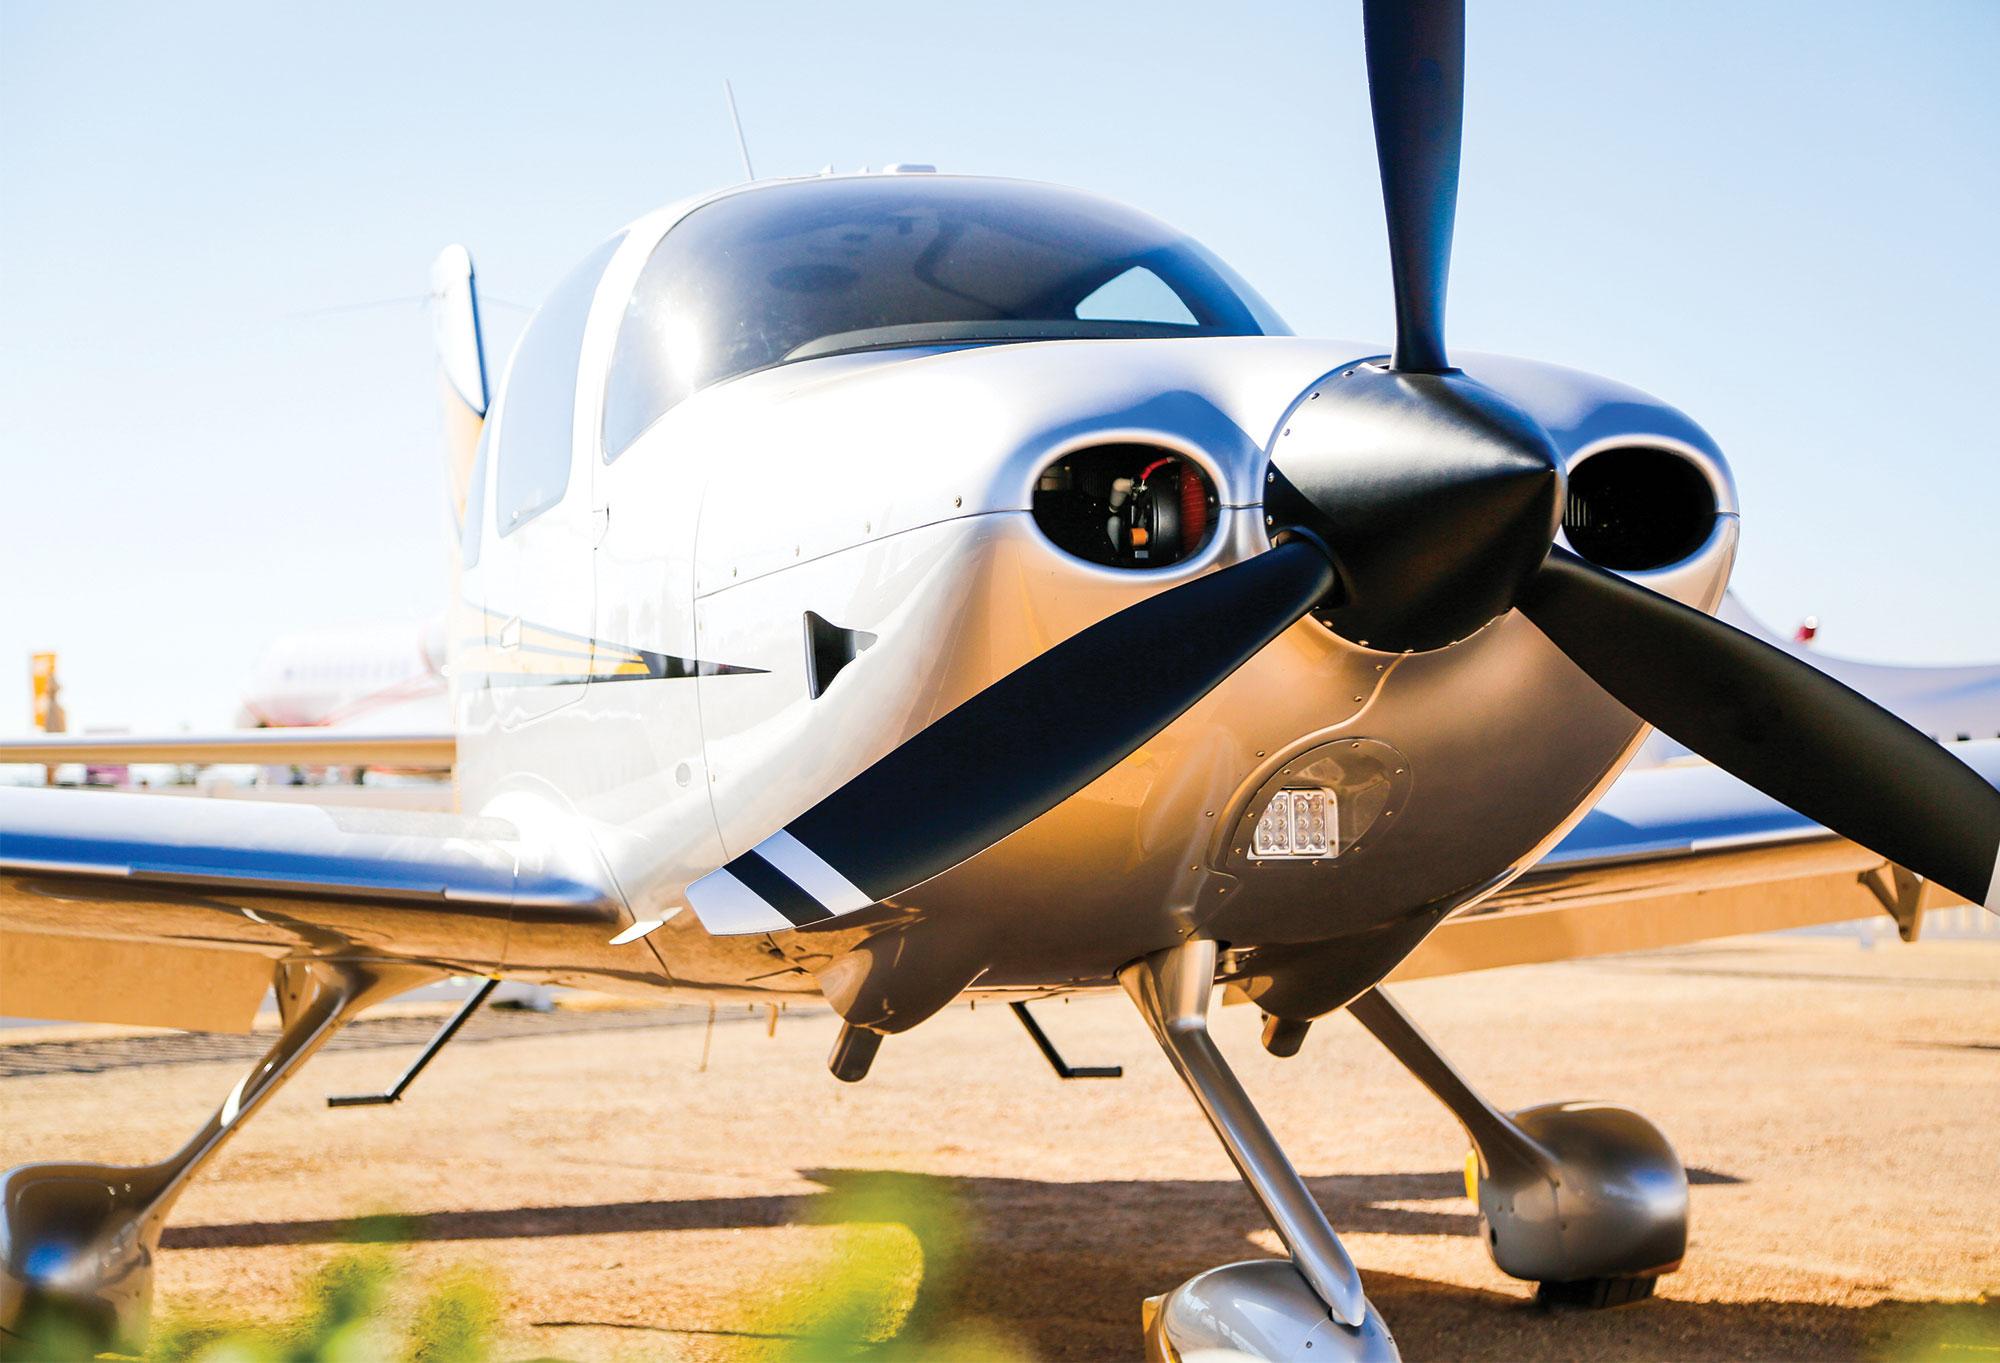 General <span>Aviation</span>